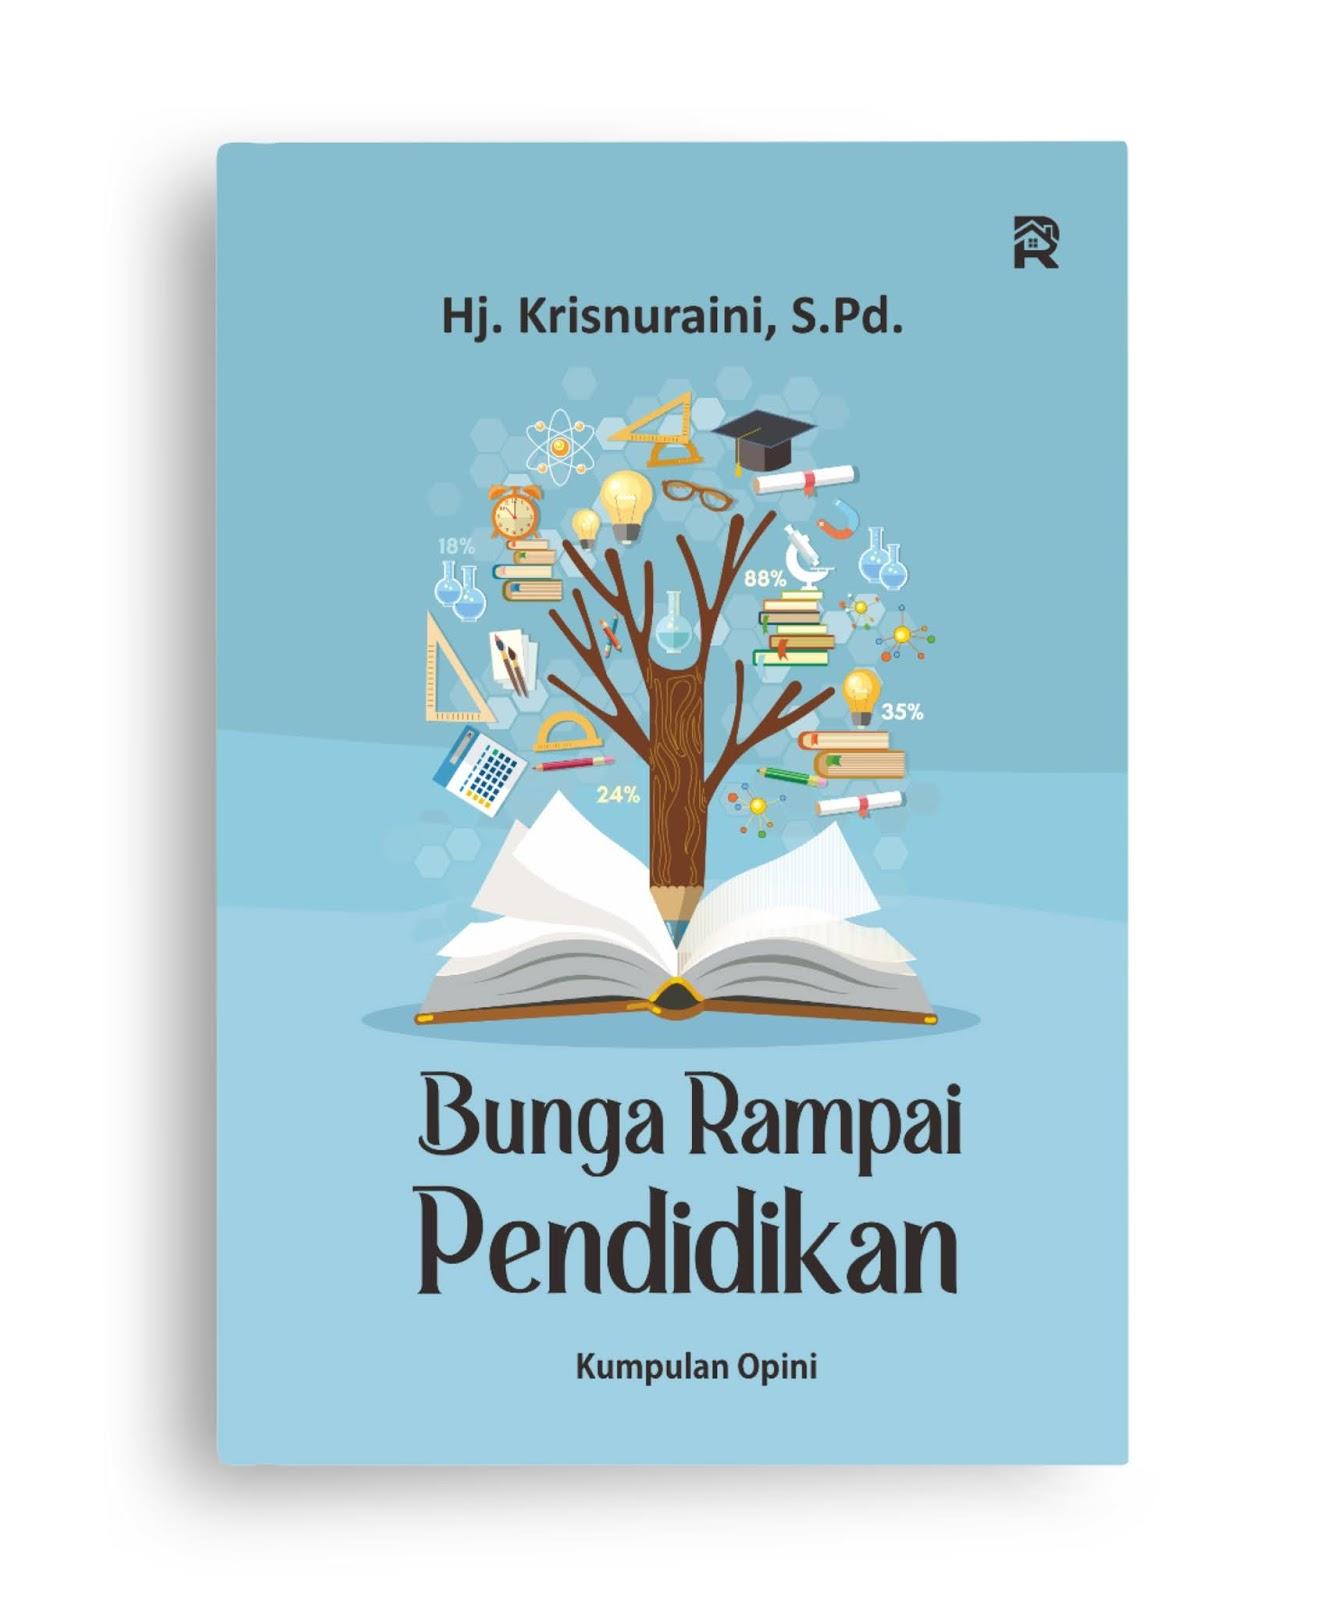 Bunga Rampai Pendidikan (Kumpulan Opini)